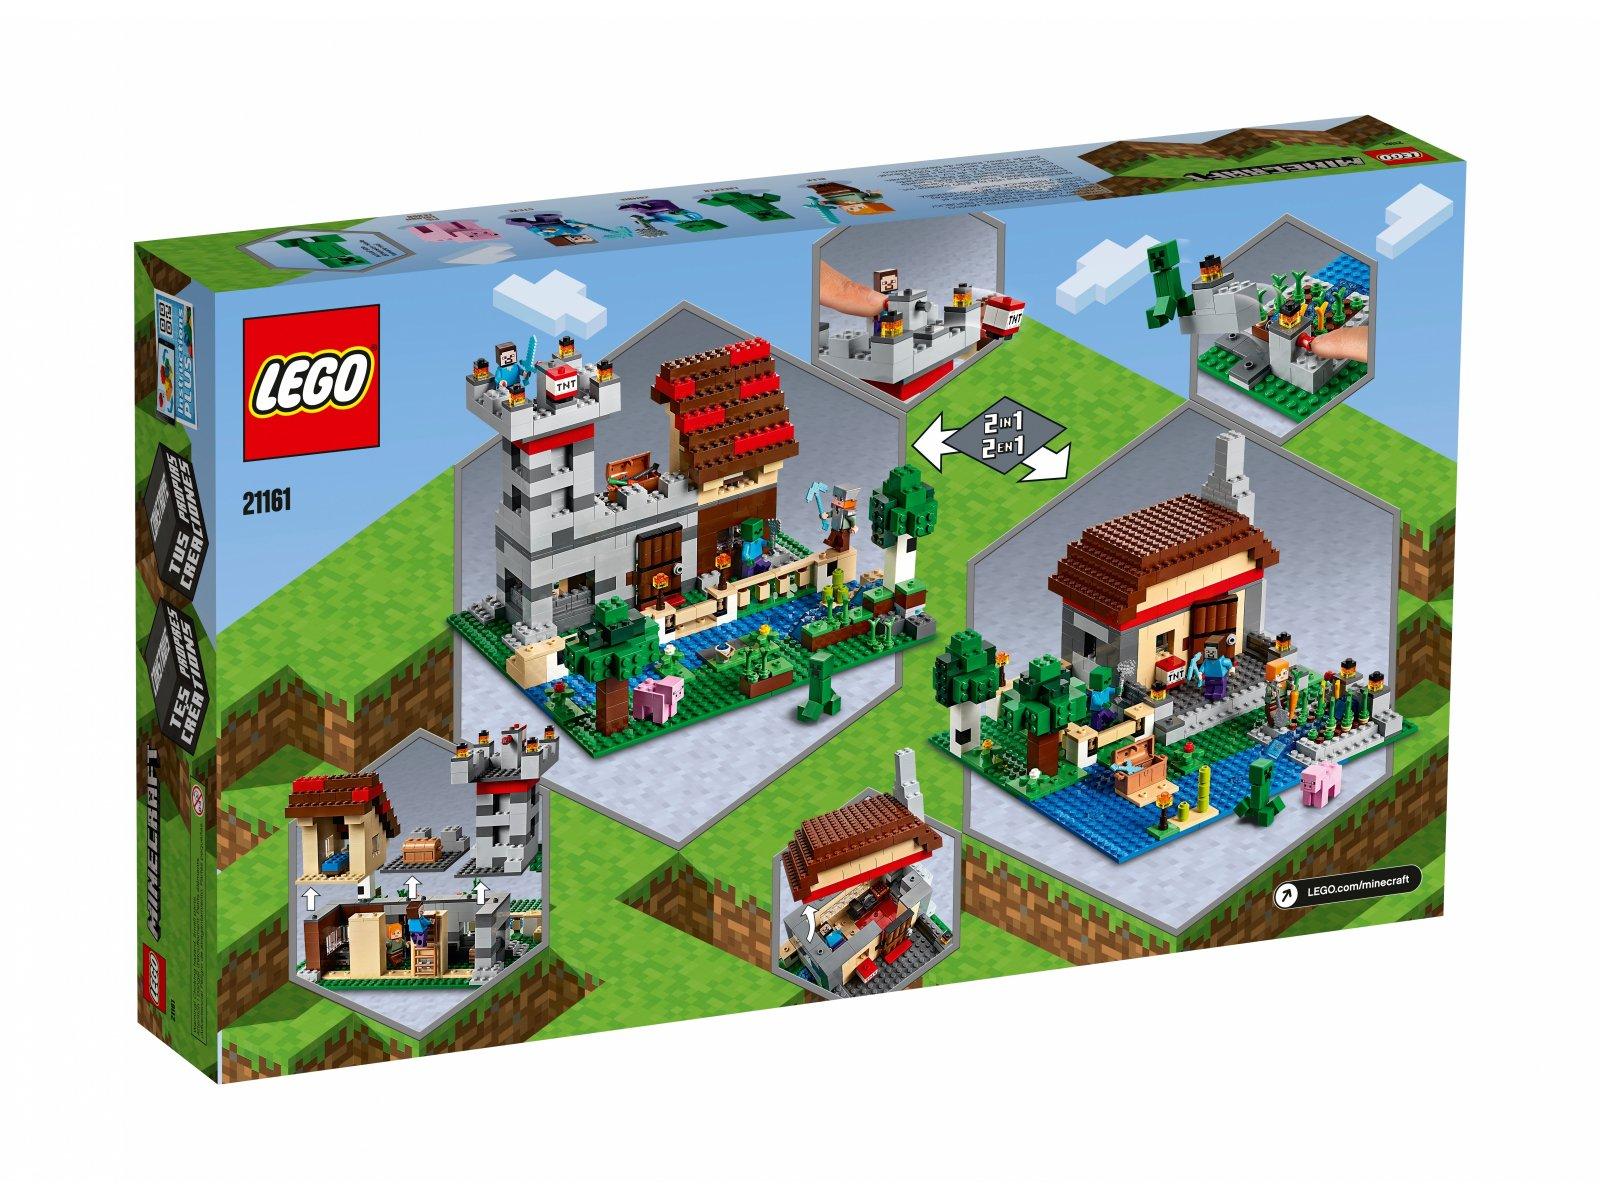 LEGO 21161 Kreatywny warsztat 3.0